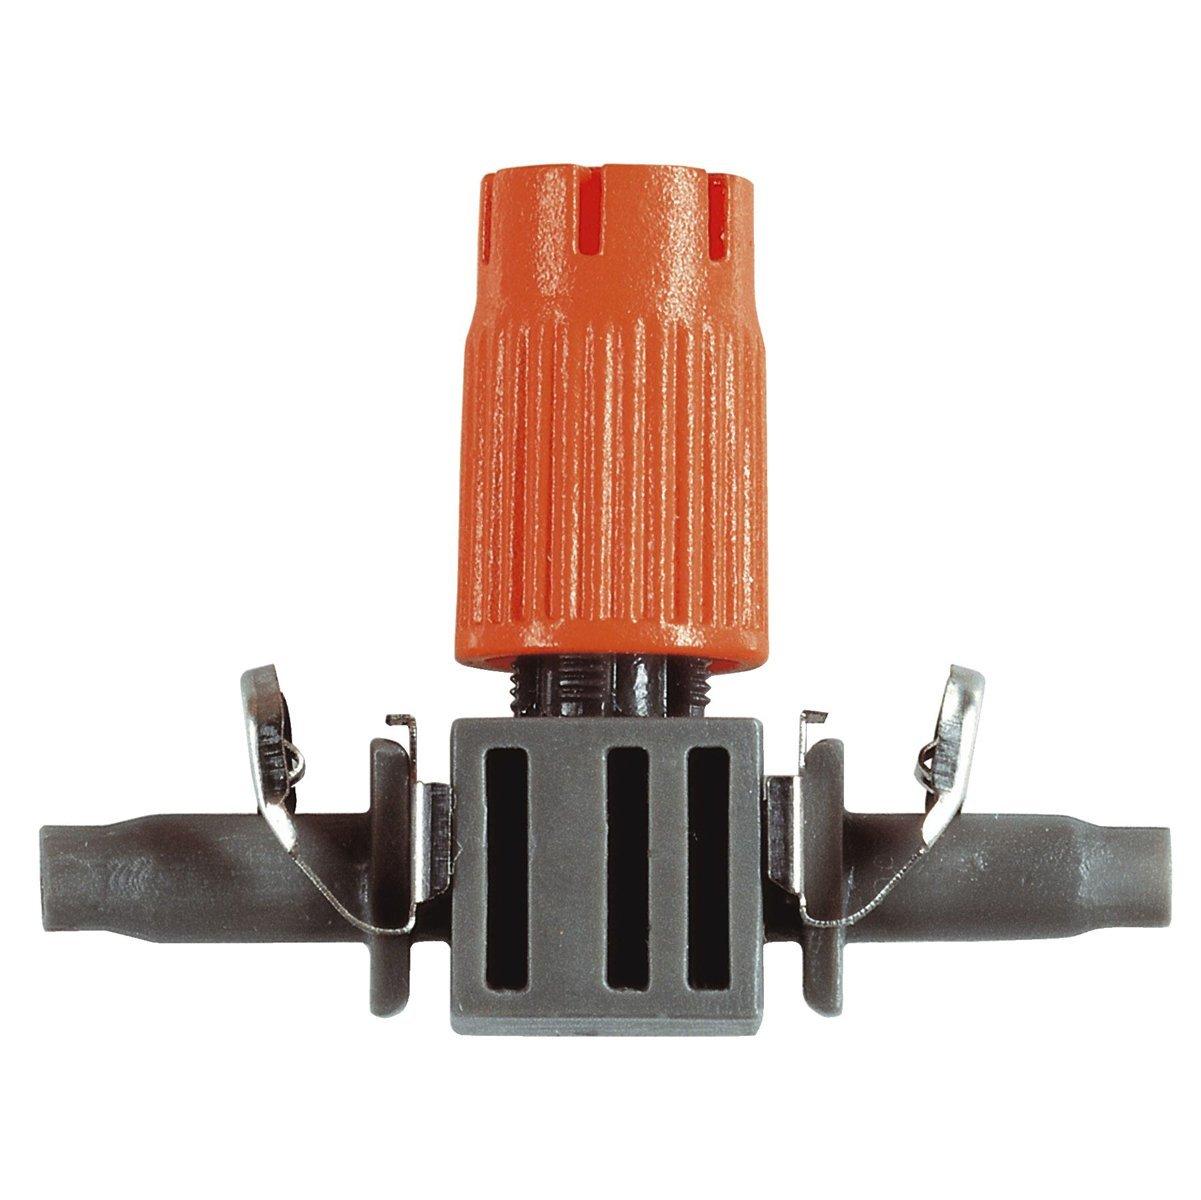 Gardena 8321-20 Kleinflachendusen 10er Pack Micro Drip System Zāles pļāvējs - Trimmeris